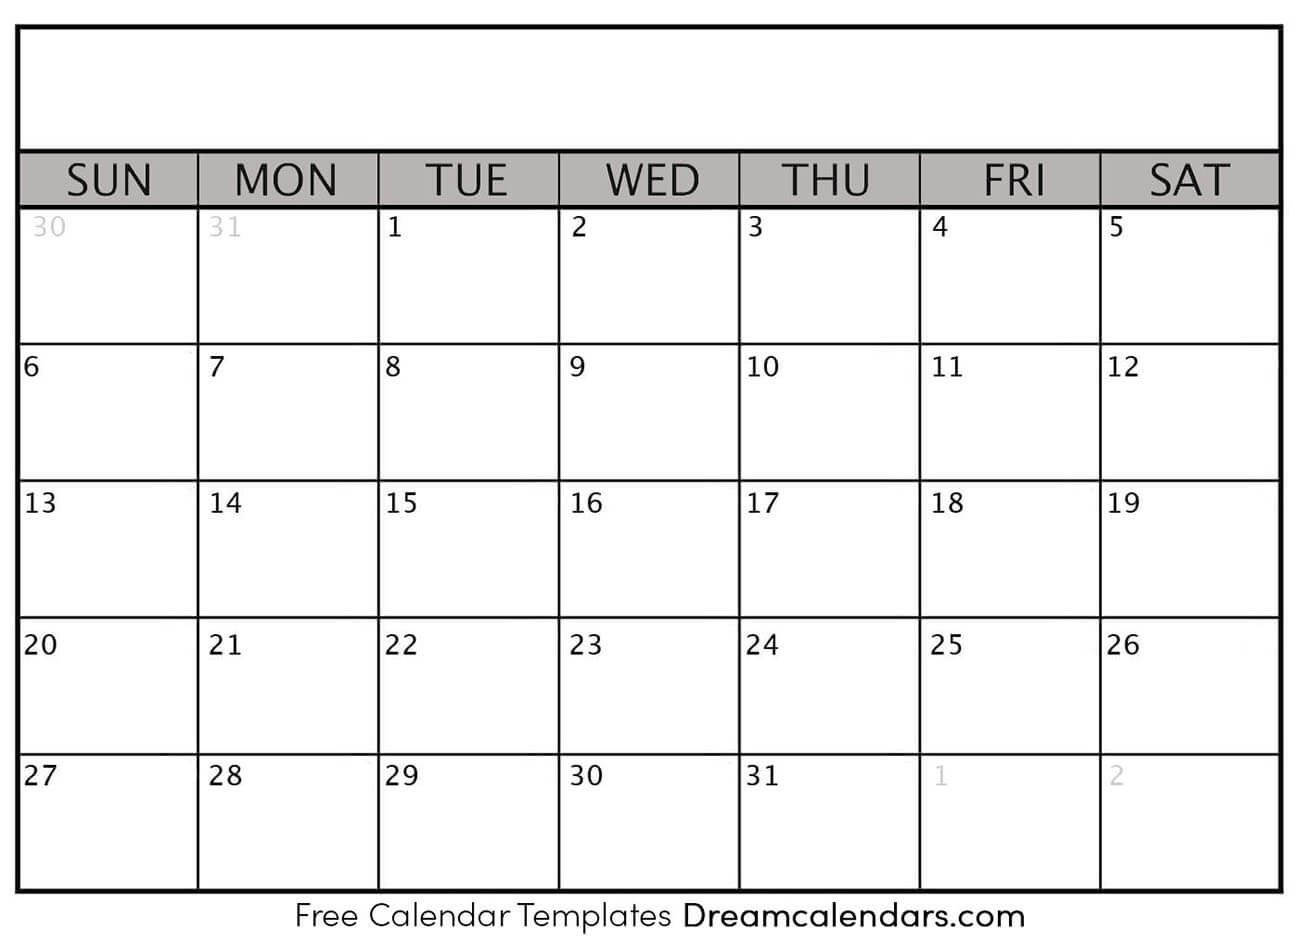 Blank Weekly Calendar Template Printable Blank Calendar Dream Calendars